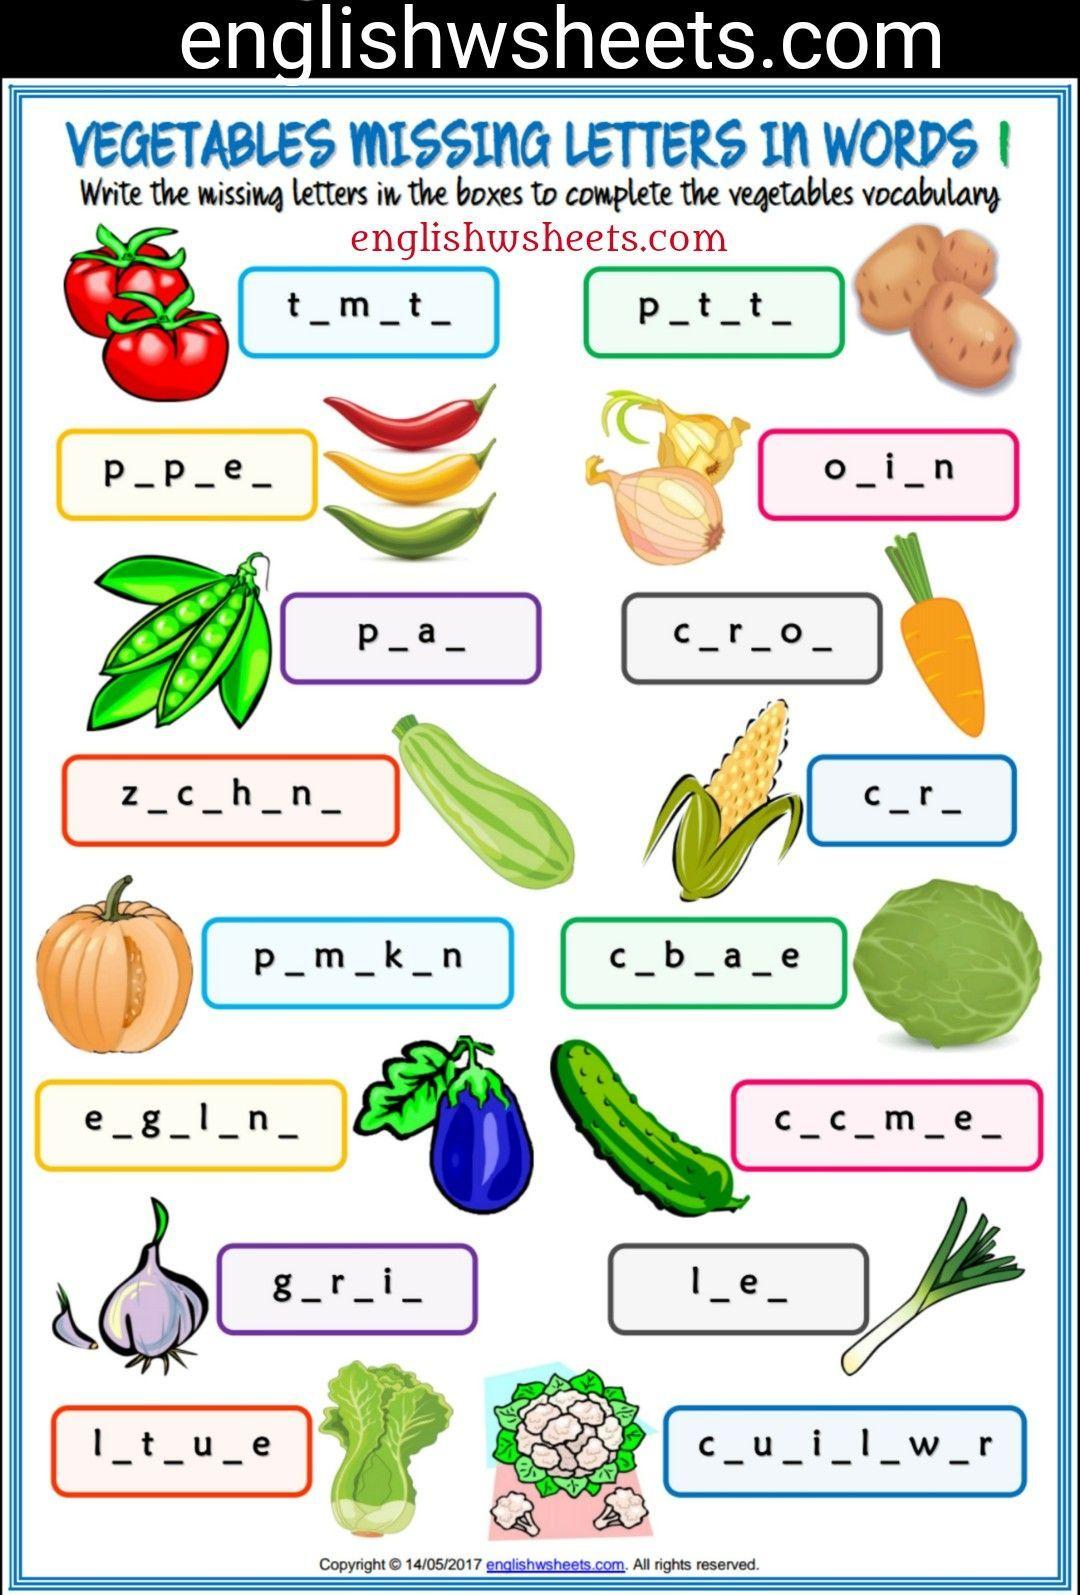 Vegetables Esl Printable Missing Letters In Words